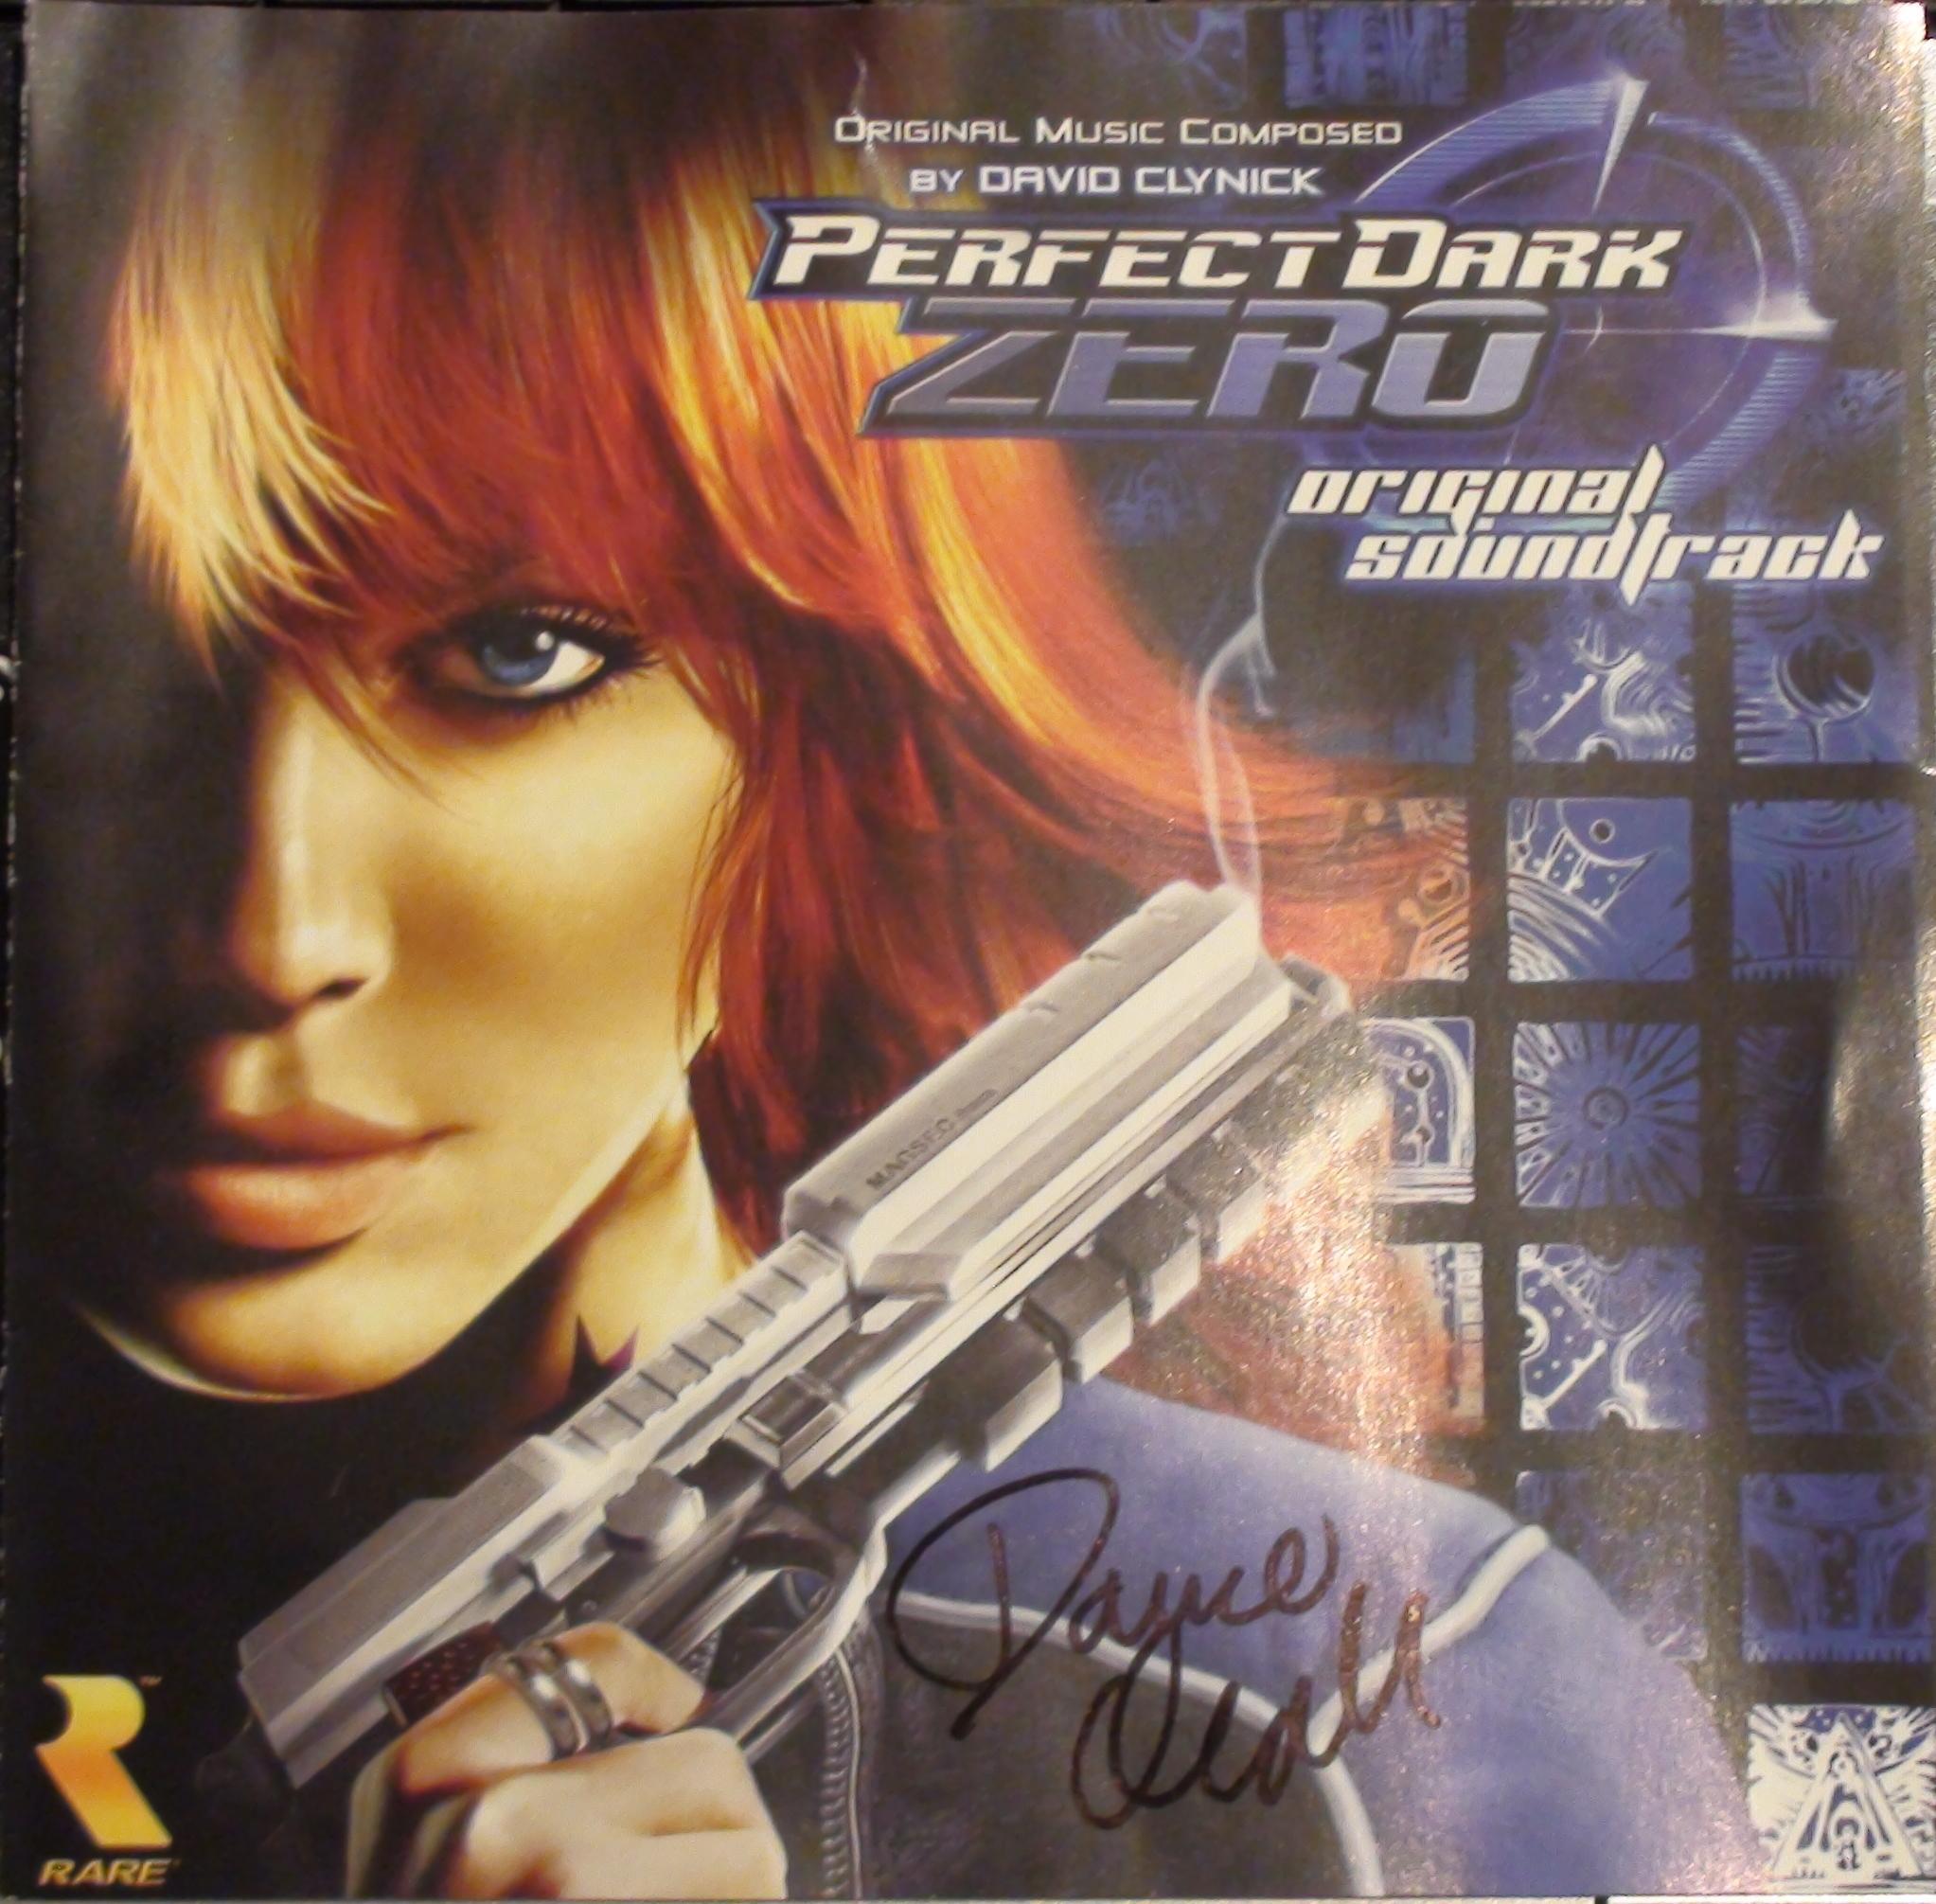 Perfect Dark Zero - David Clynick